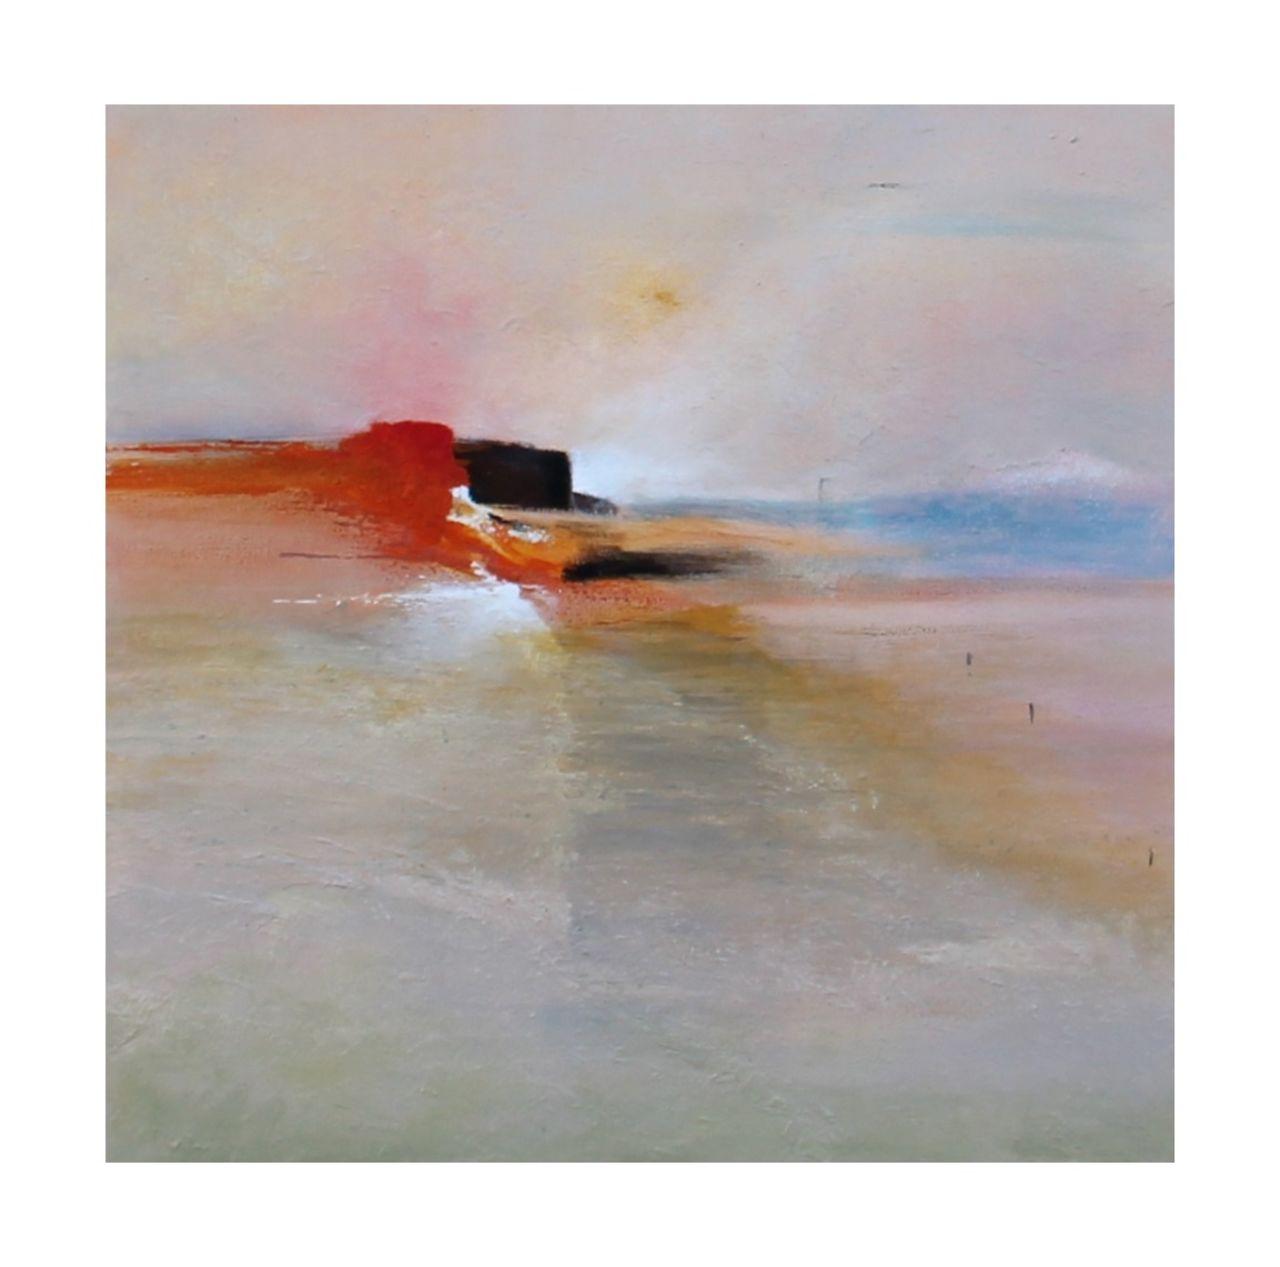 Gilles MERMEJEAN Peinture Gilles Mermejean 20190308 60x60